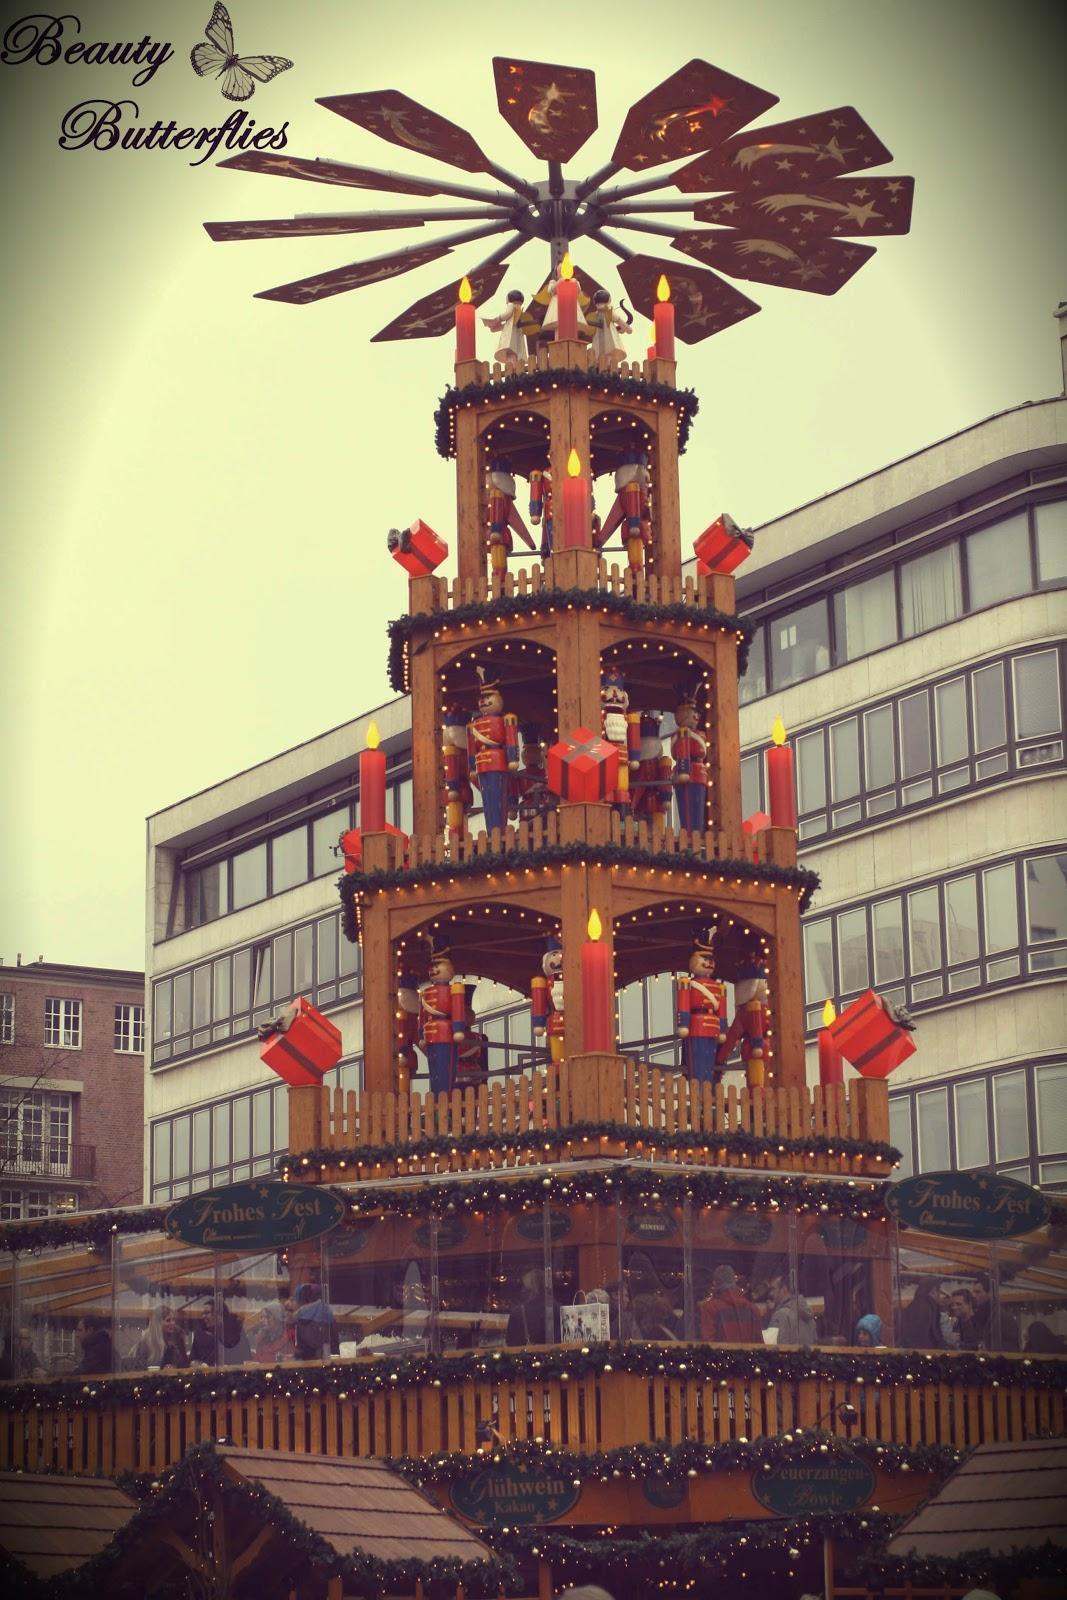 Hannover Weihnachtsmarkt.Hannover Weihnachtsmarkt 2012